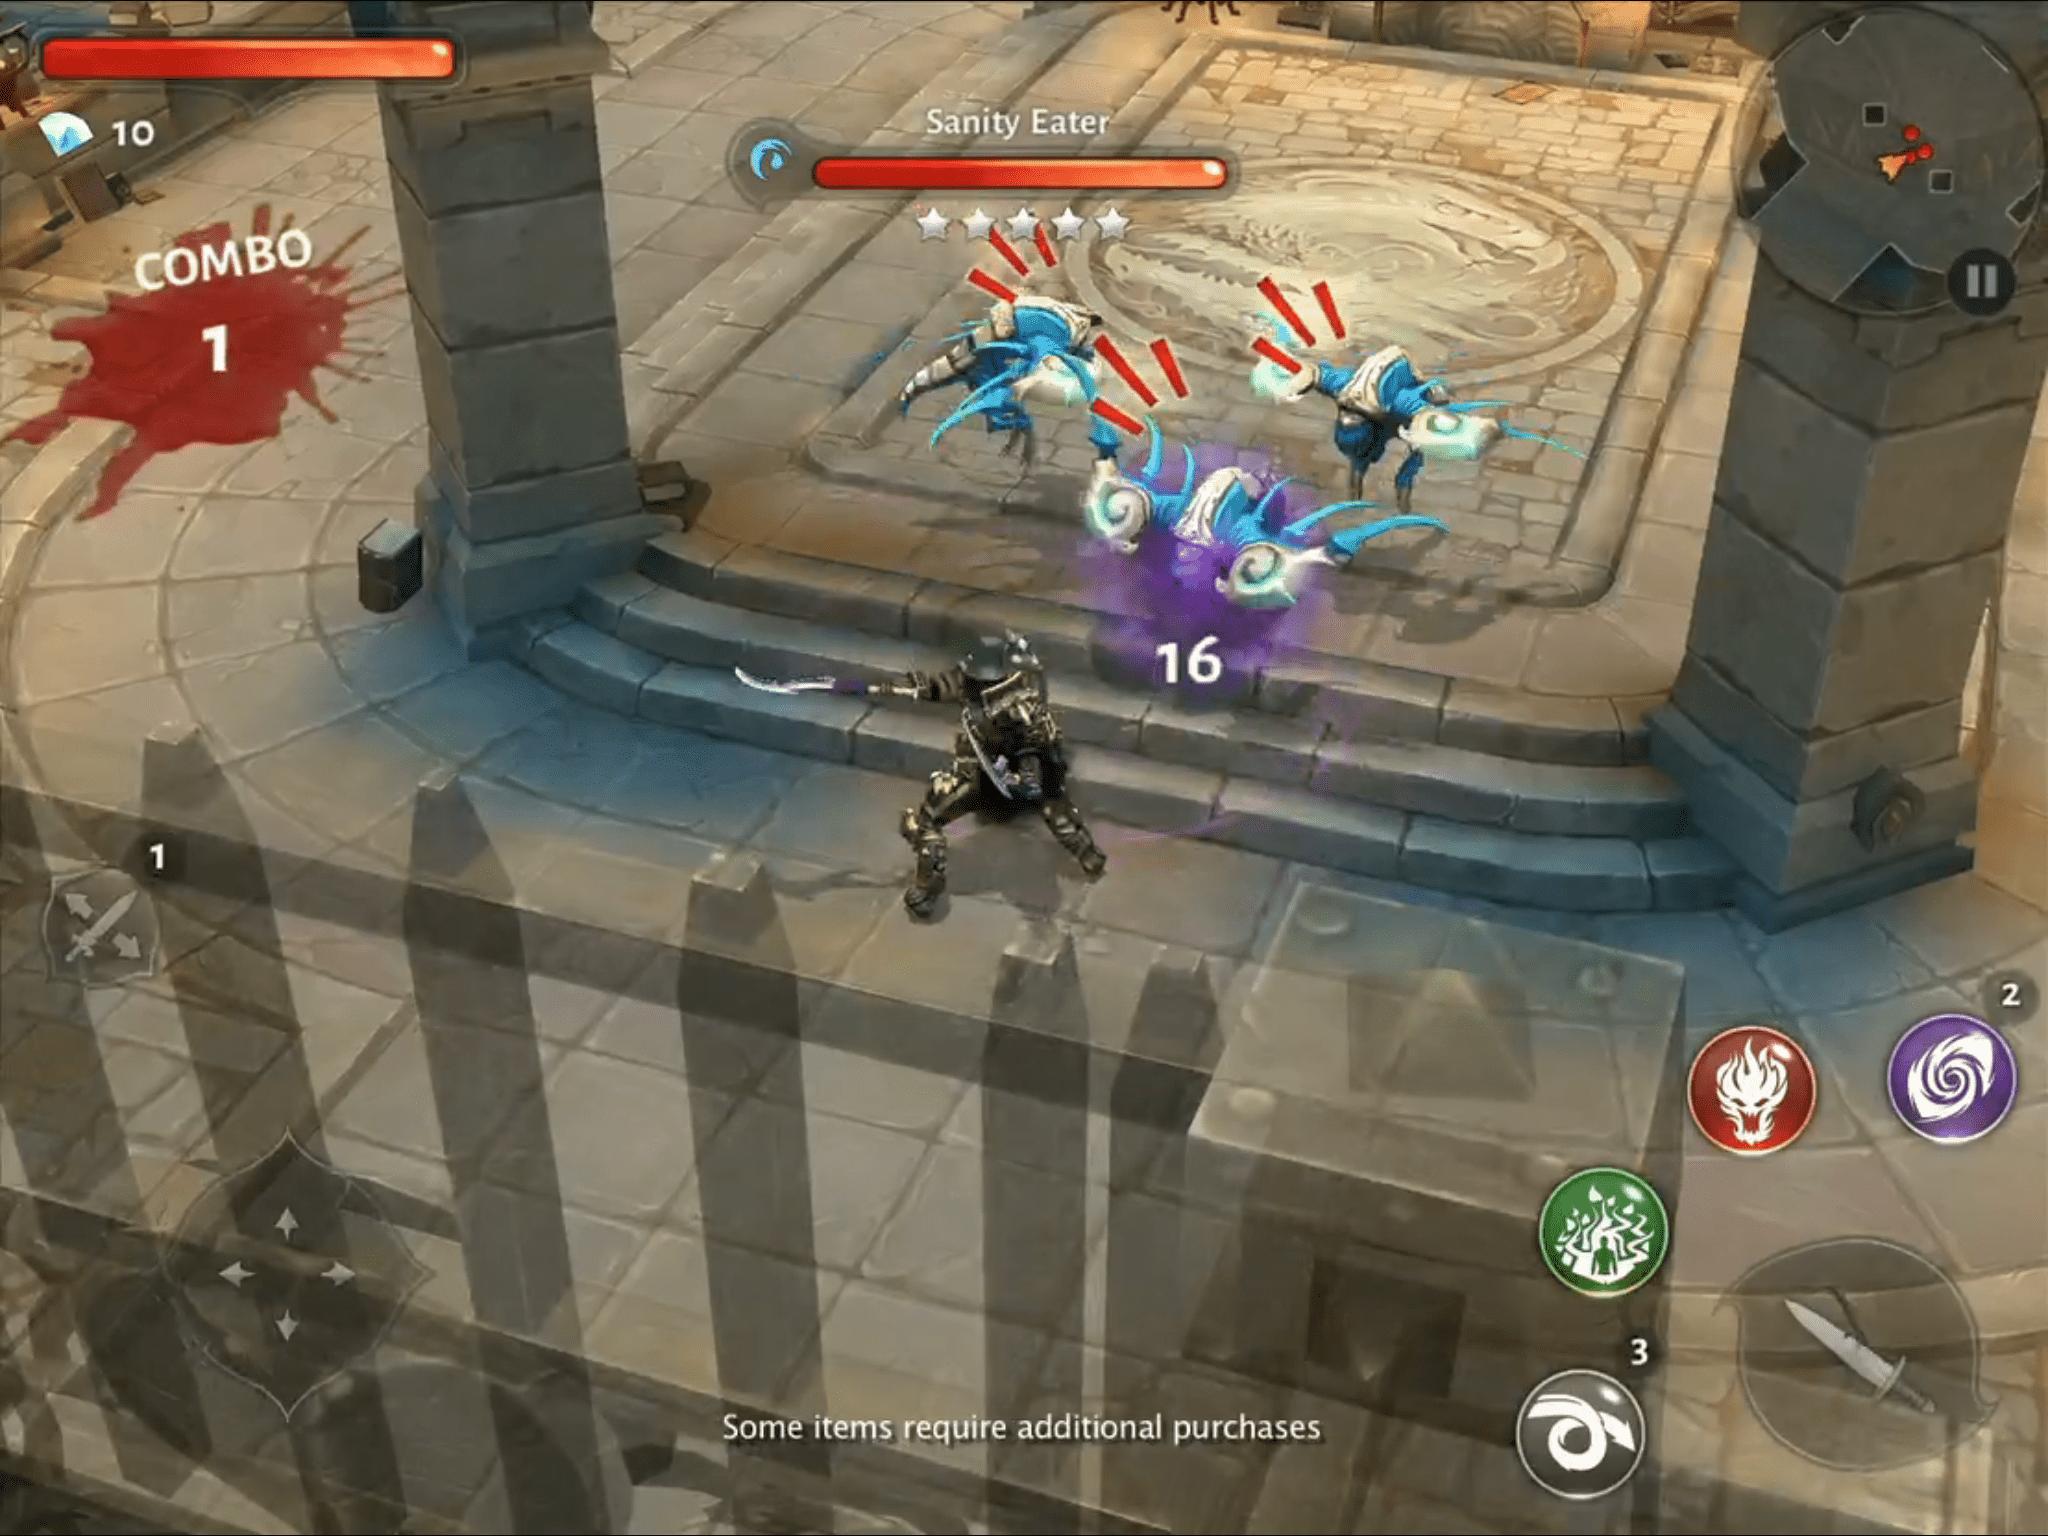 Dungeon Hunter 5 battle scene with score